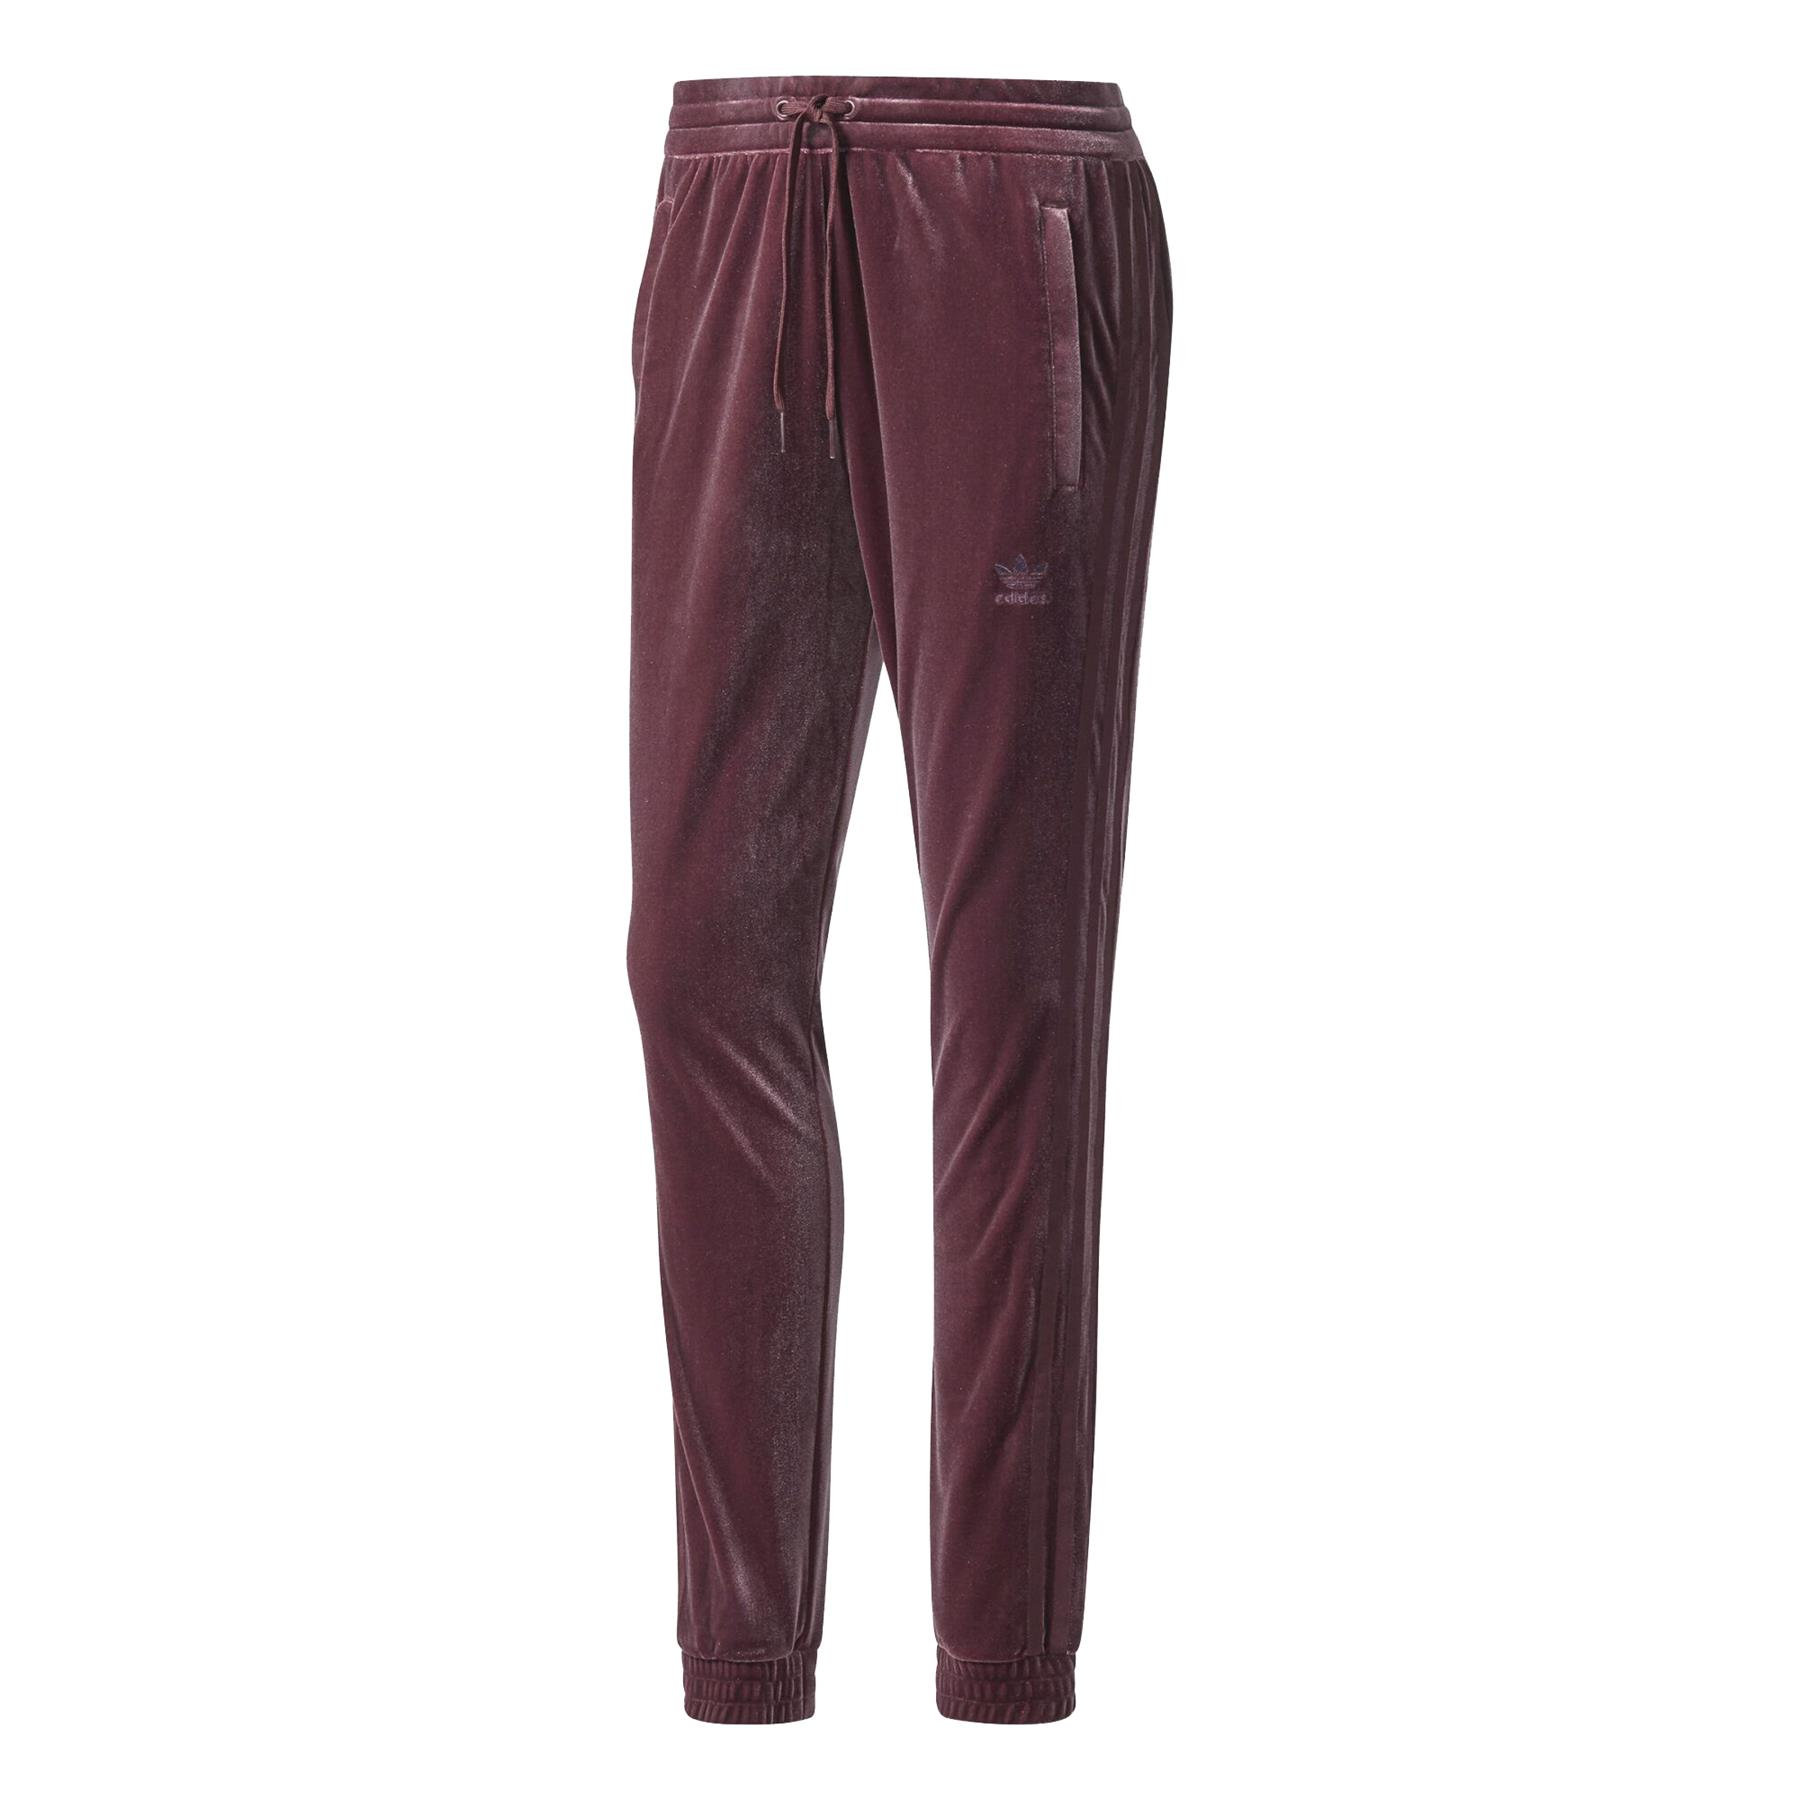 adidas pantaloni in velluto